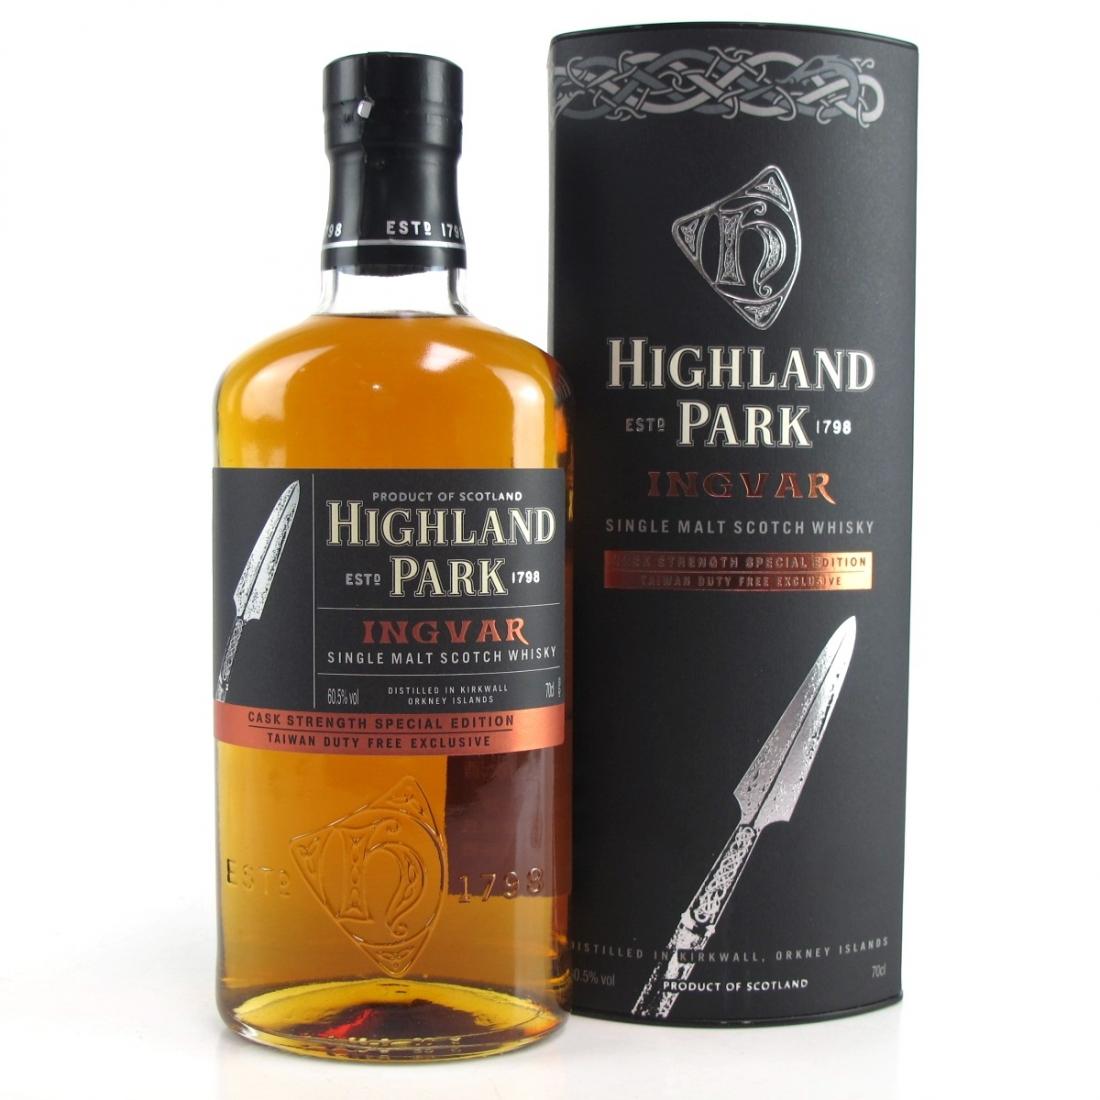 Highland Park Ingvar Cask Strength Special Edition